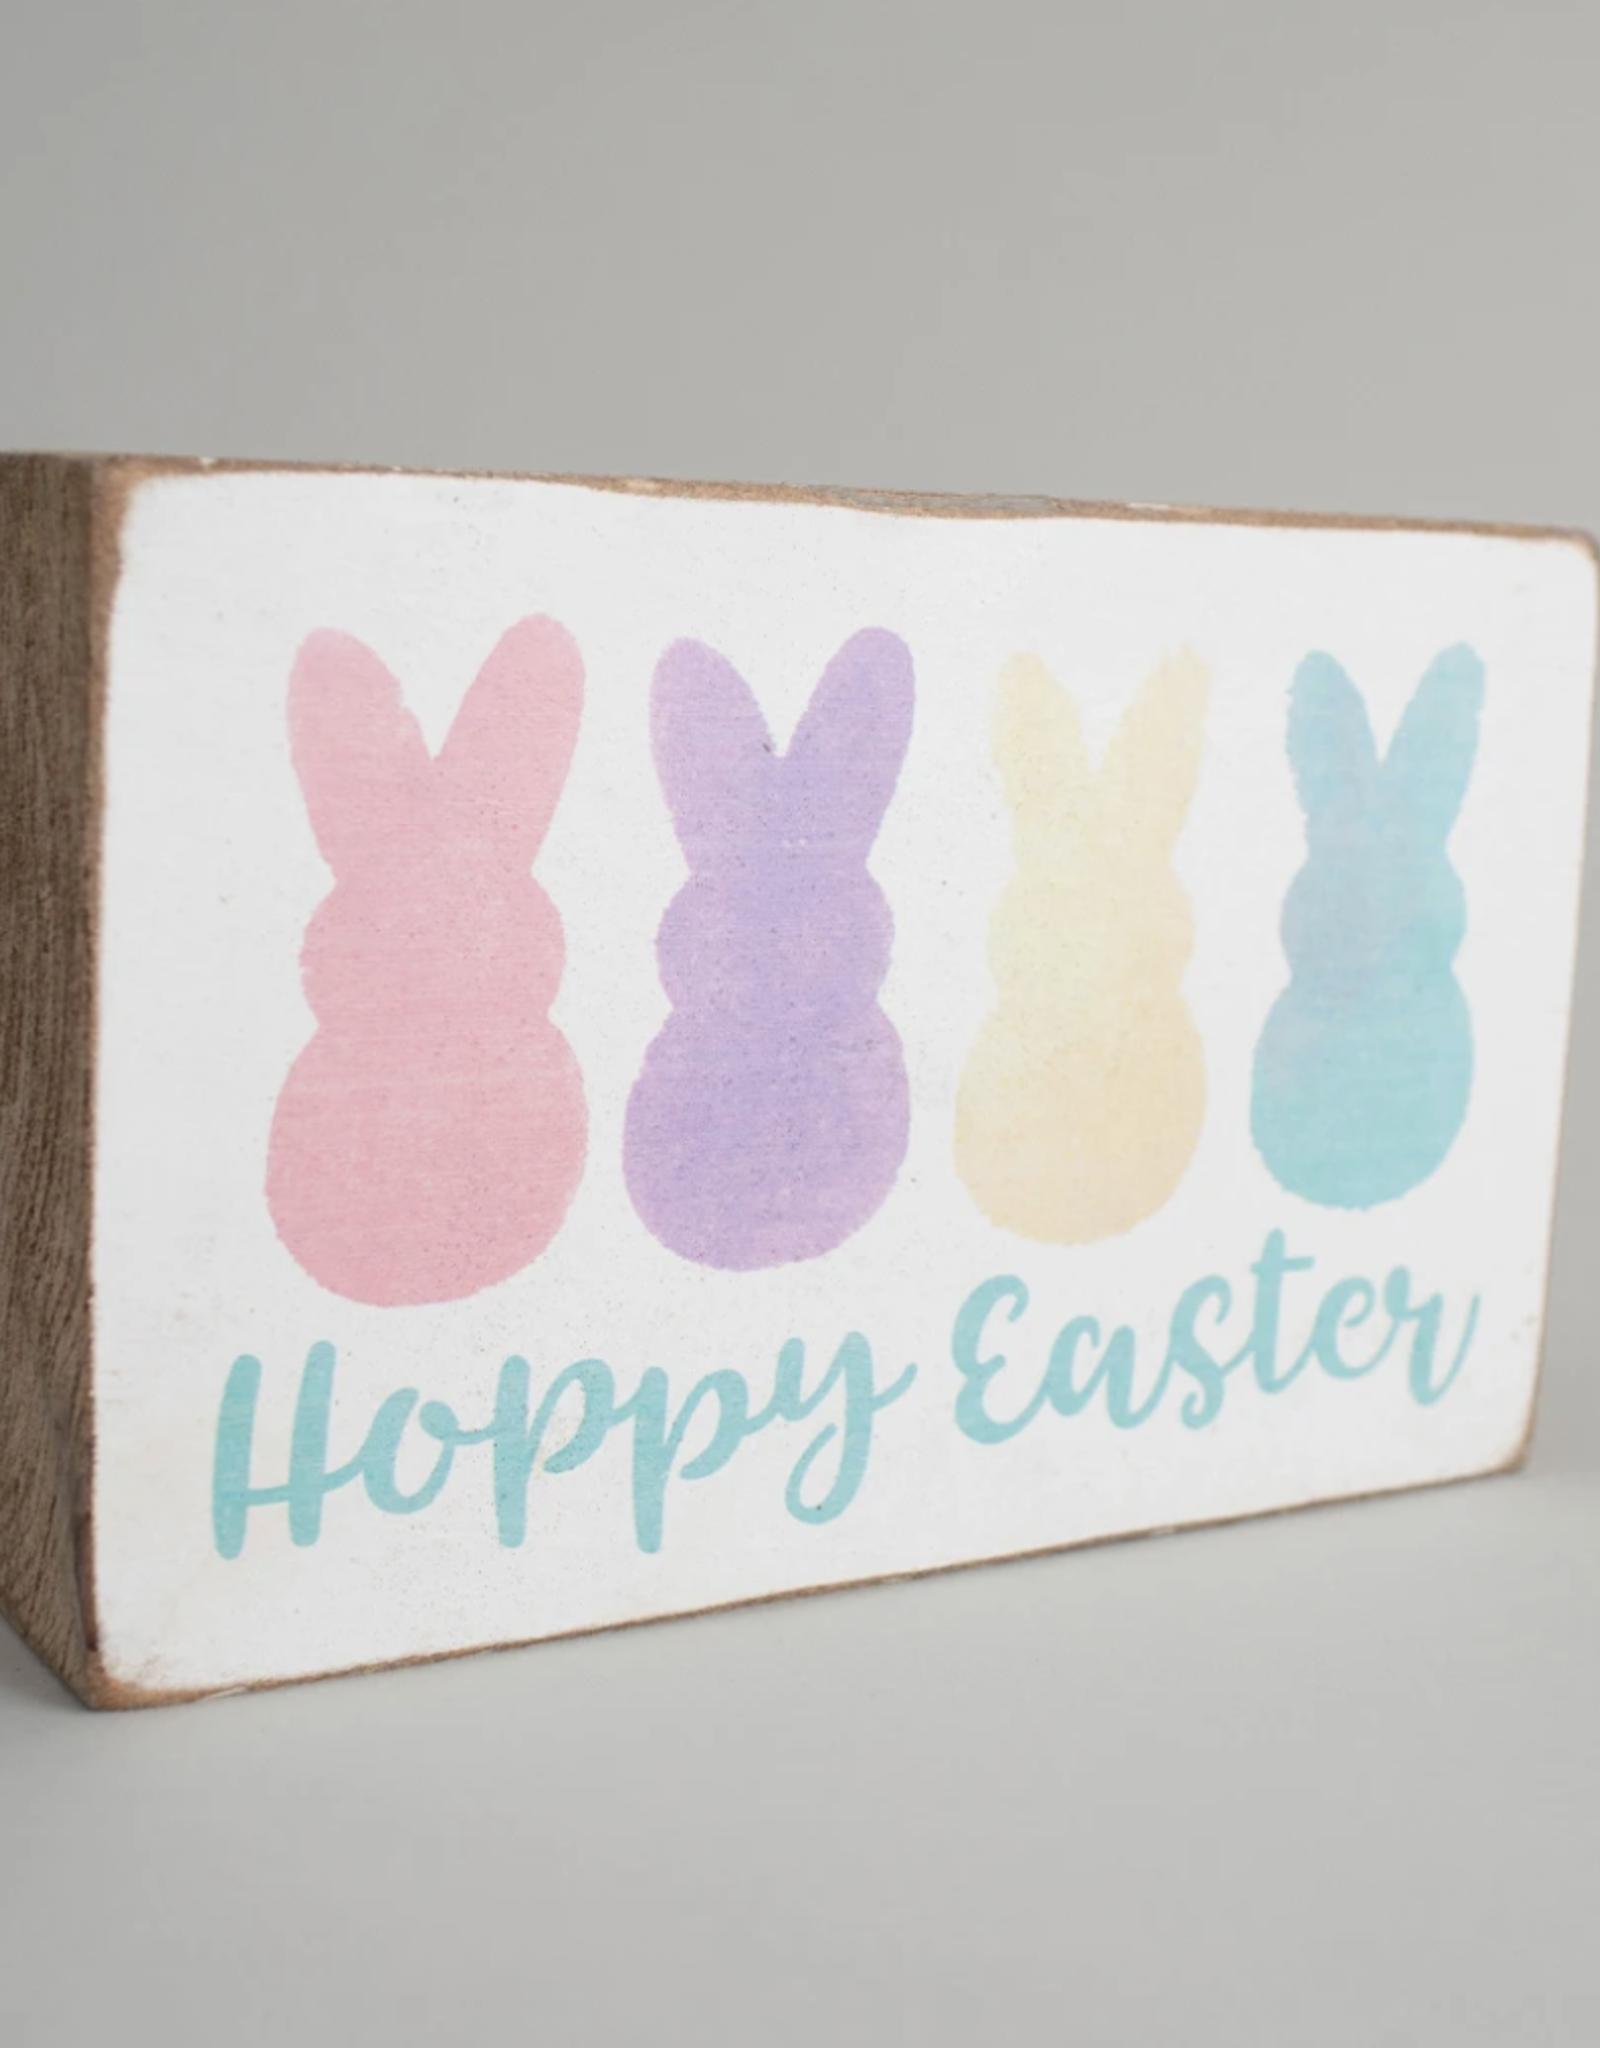 Rustic Marlin Rustic Marlin - Hoppy Easter XL Block